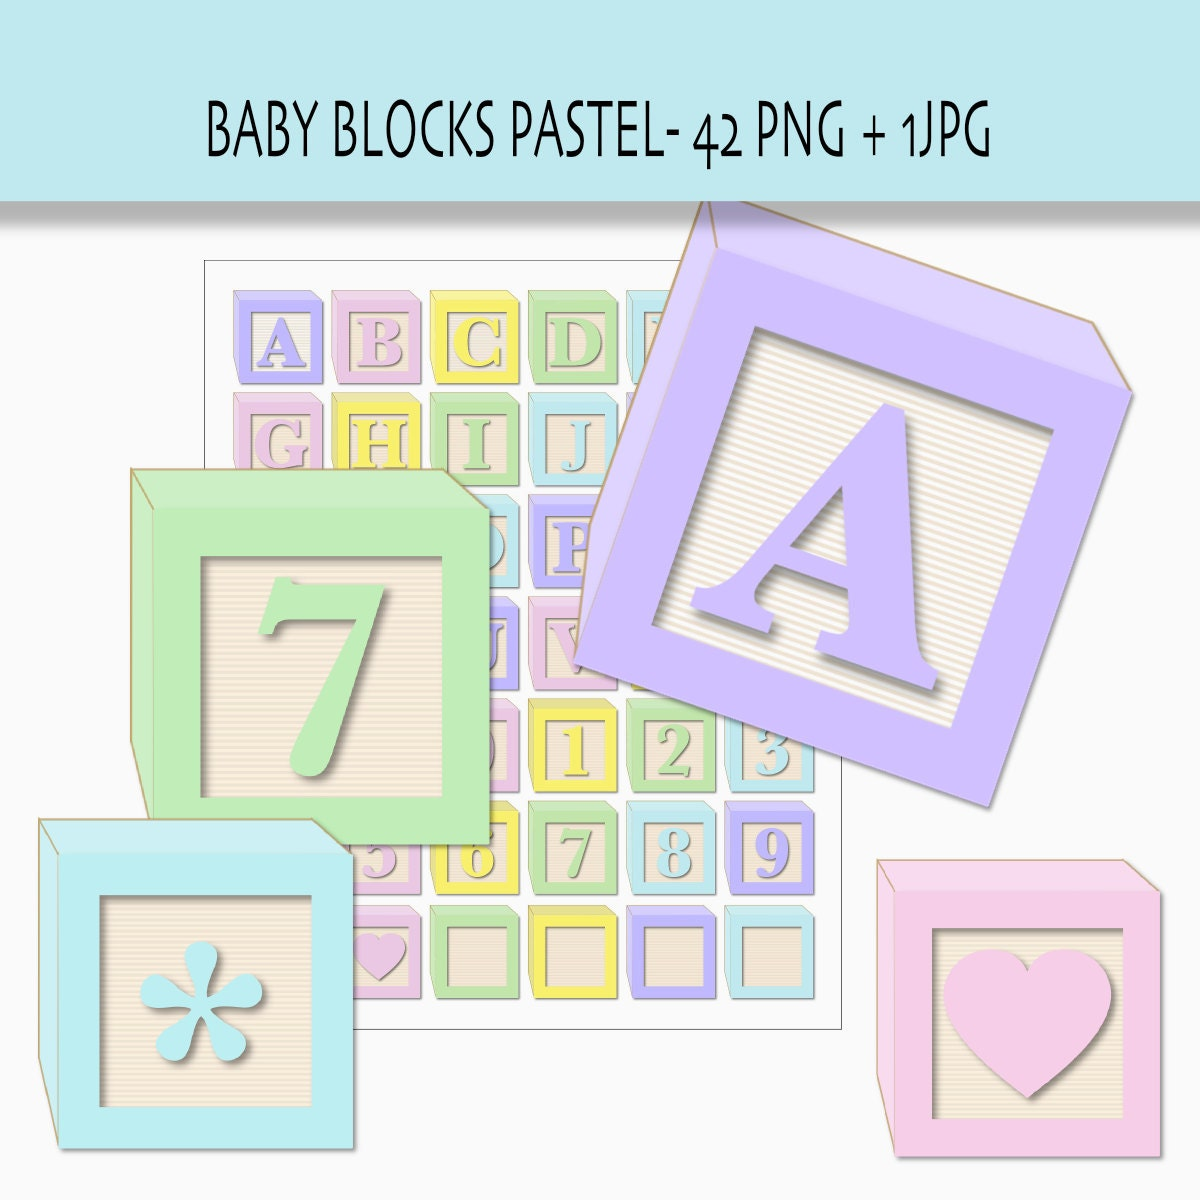 Baby blocks alphabet and numbers clip art in by ValerianeDigital